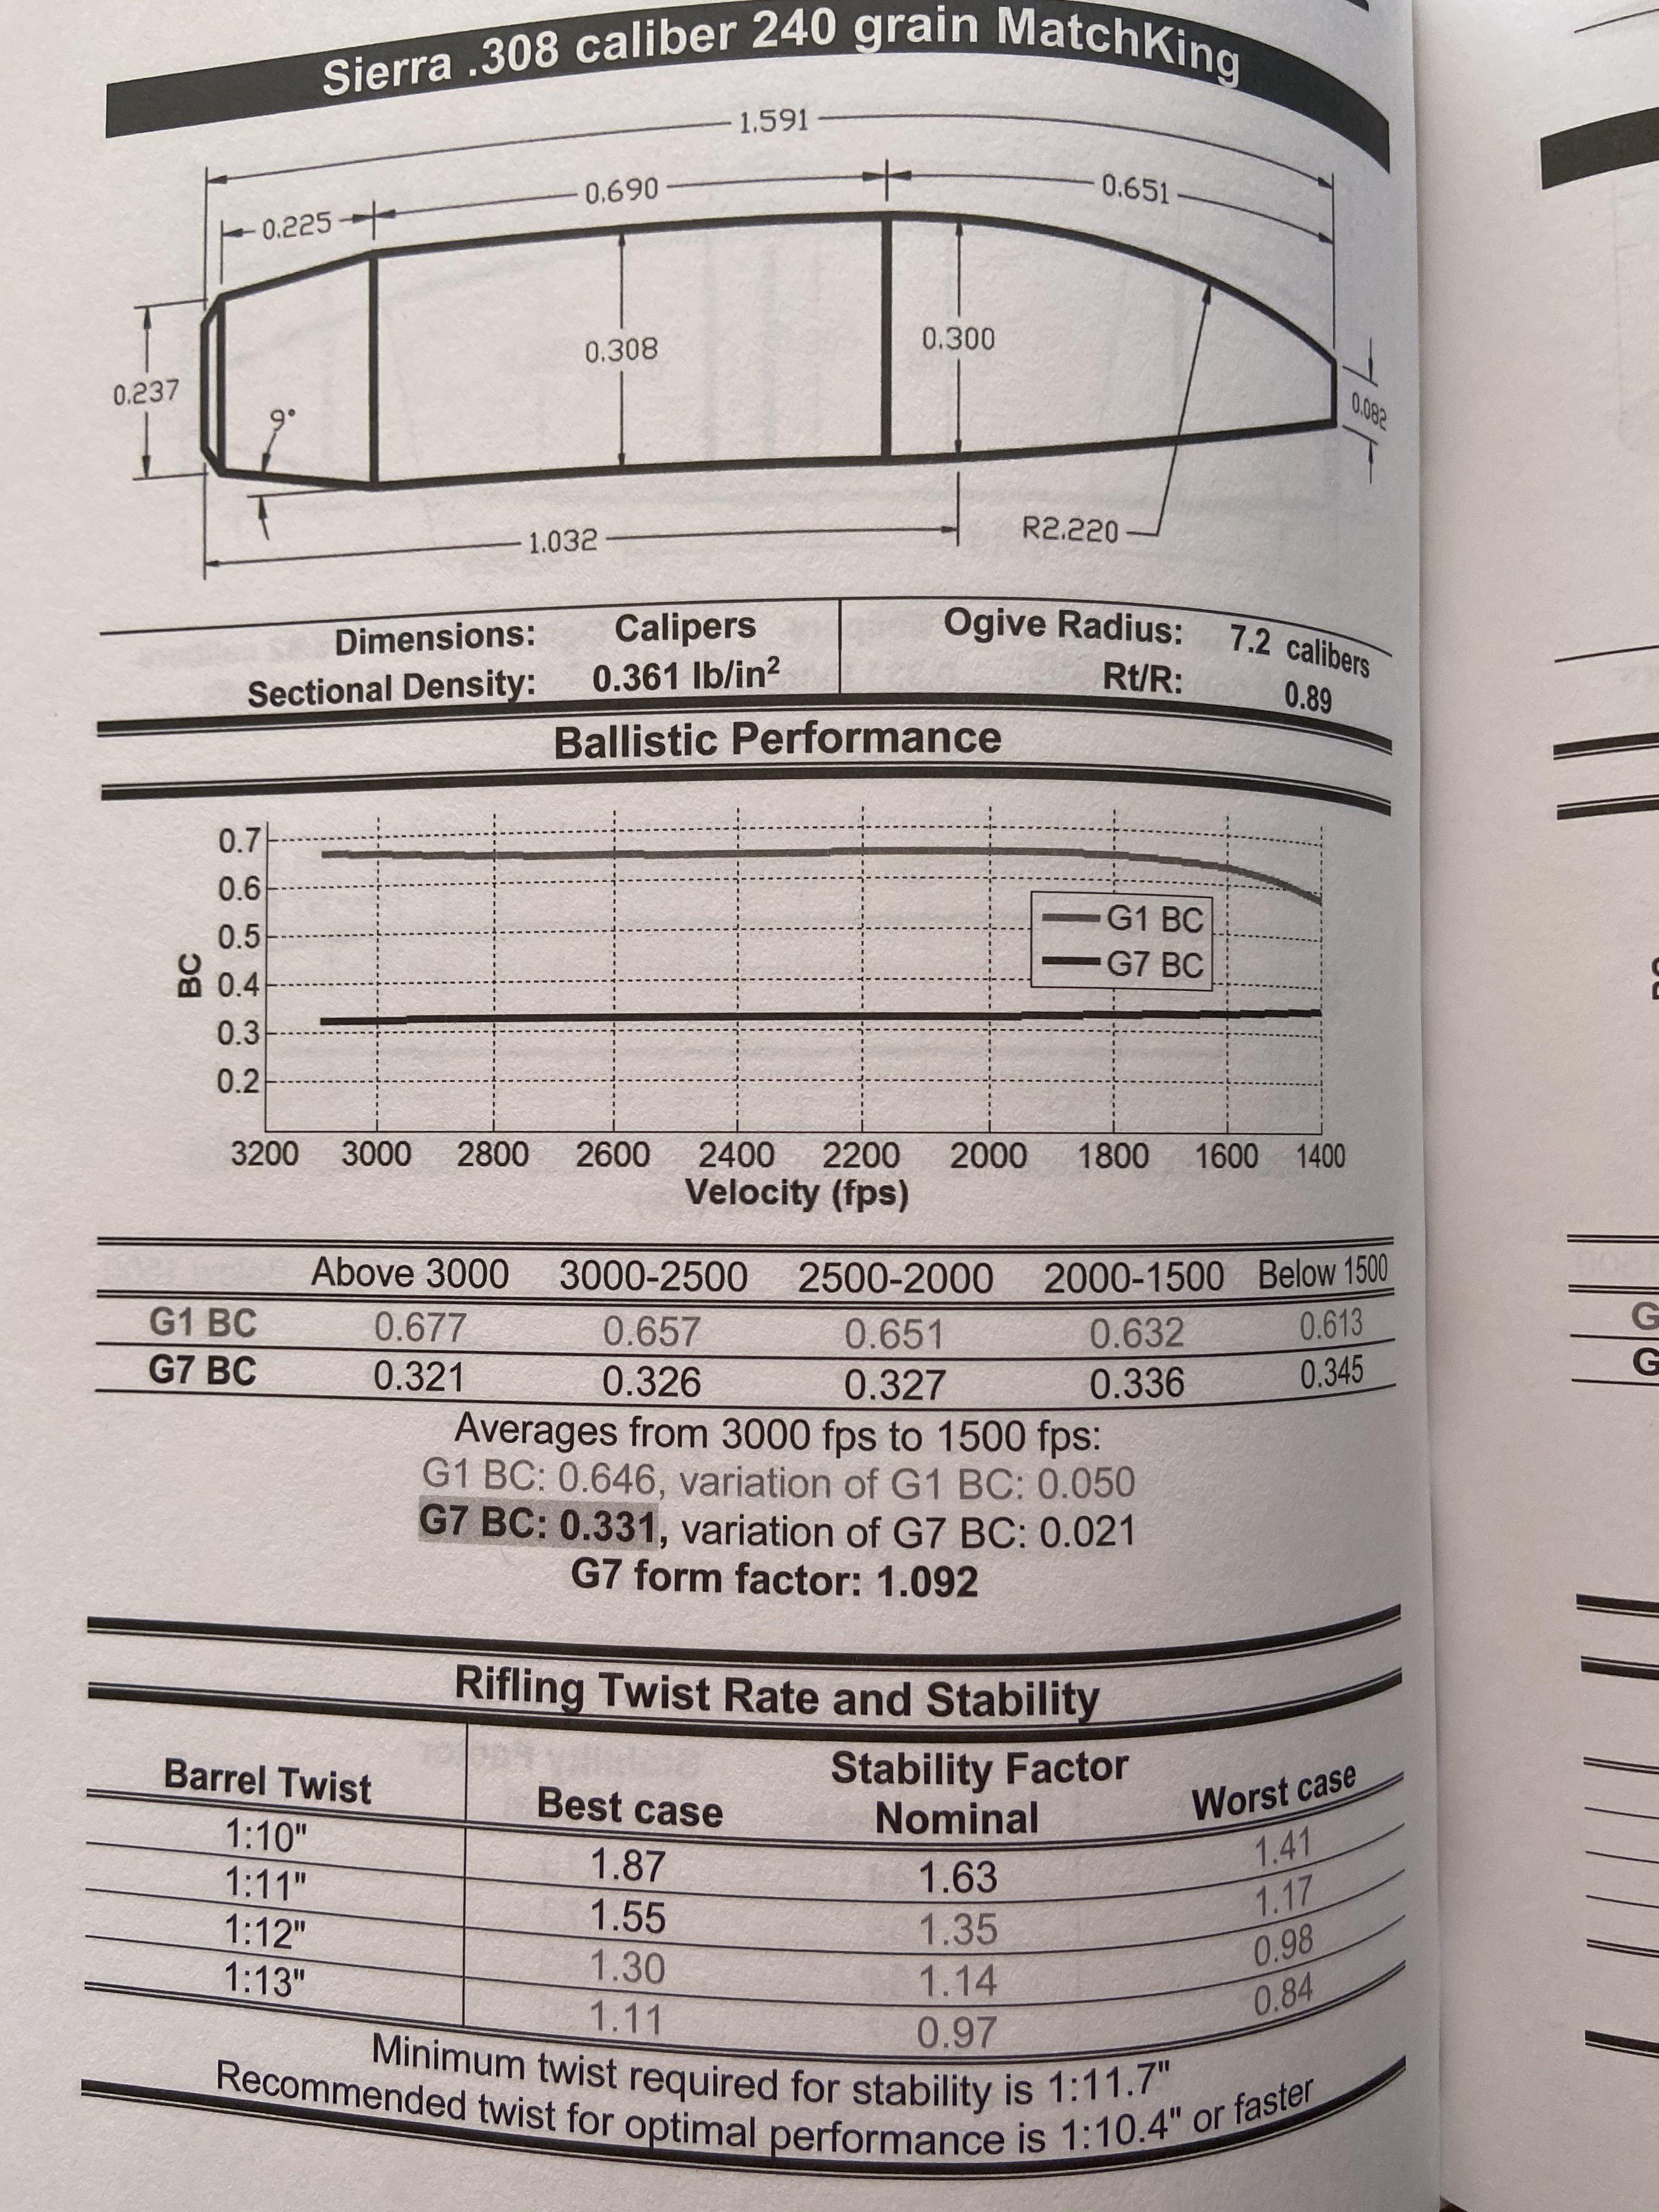 E2195400-D70E-489E-A1FE-3470B3BC16CB.jpeg